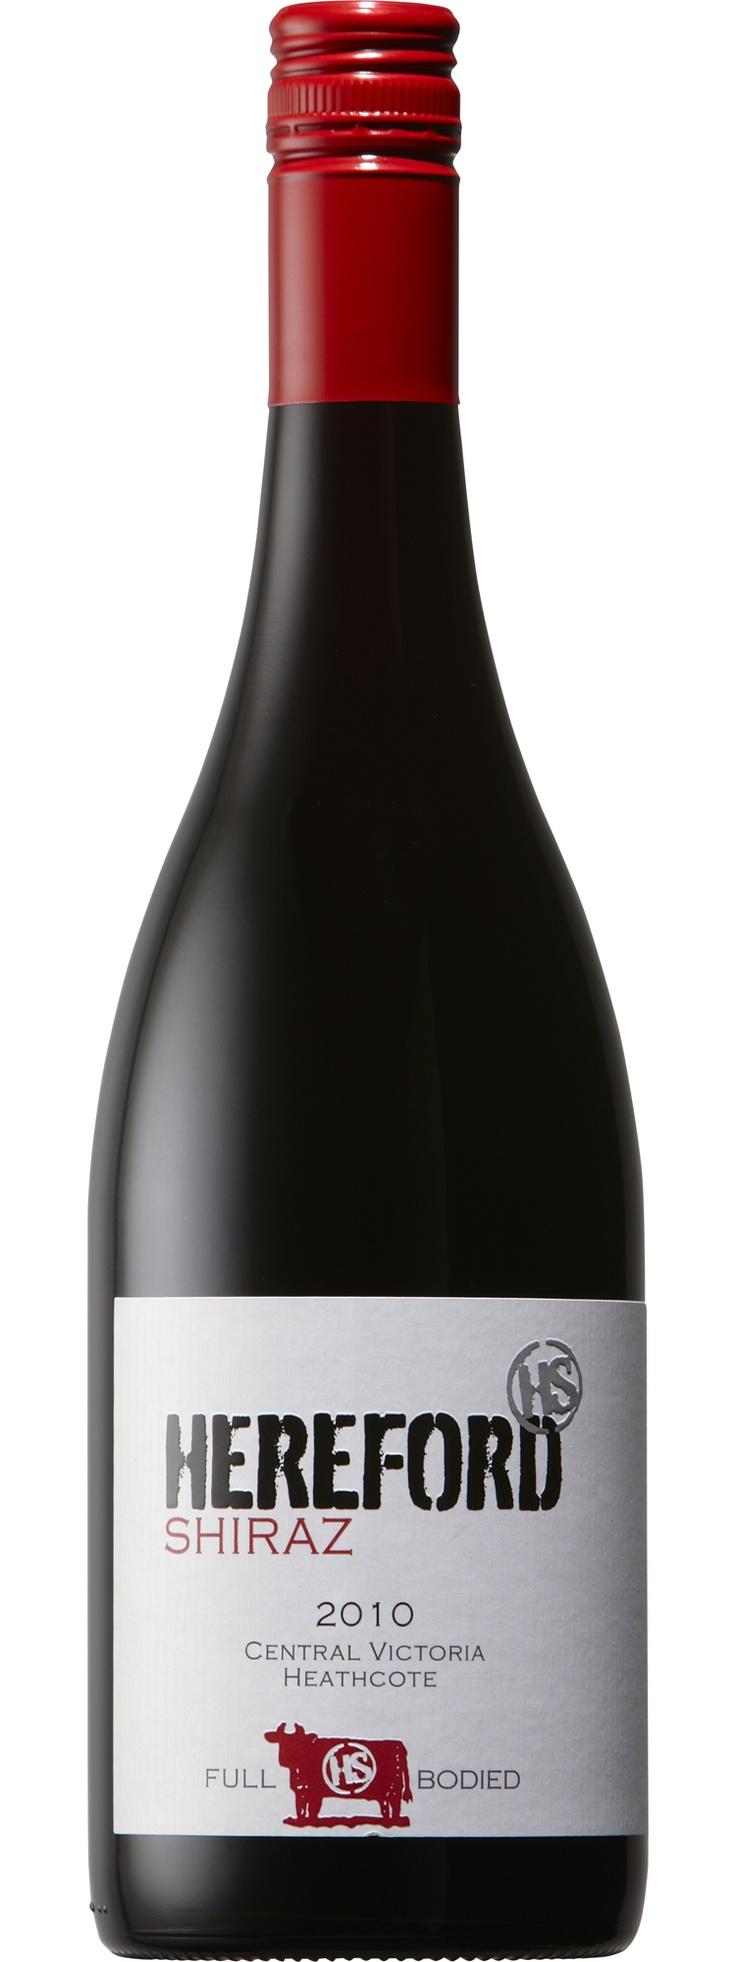 Hereford Shiraz | Dan Murphy's | Buy Wine, Champagne, Beer & Spirits Online